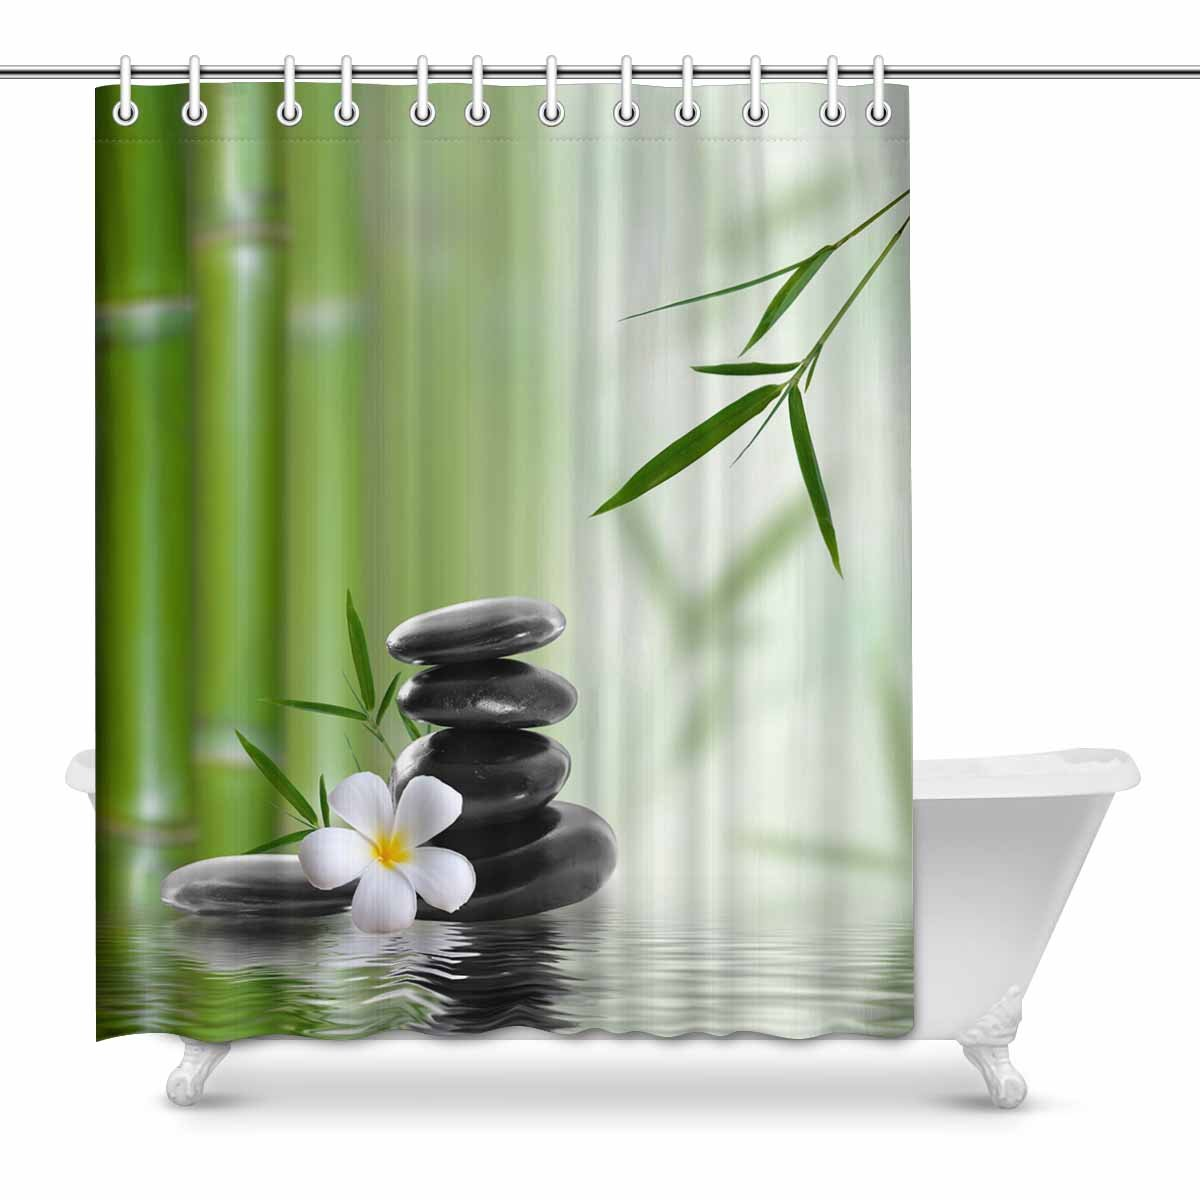 1 Pc Waterproof Bridge-in-Tree Shower Curtain for Home /& Bathroom